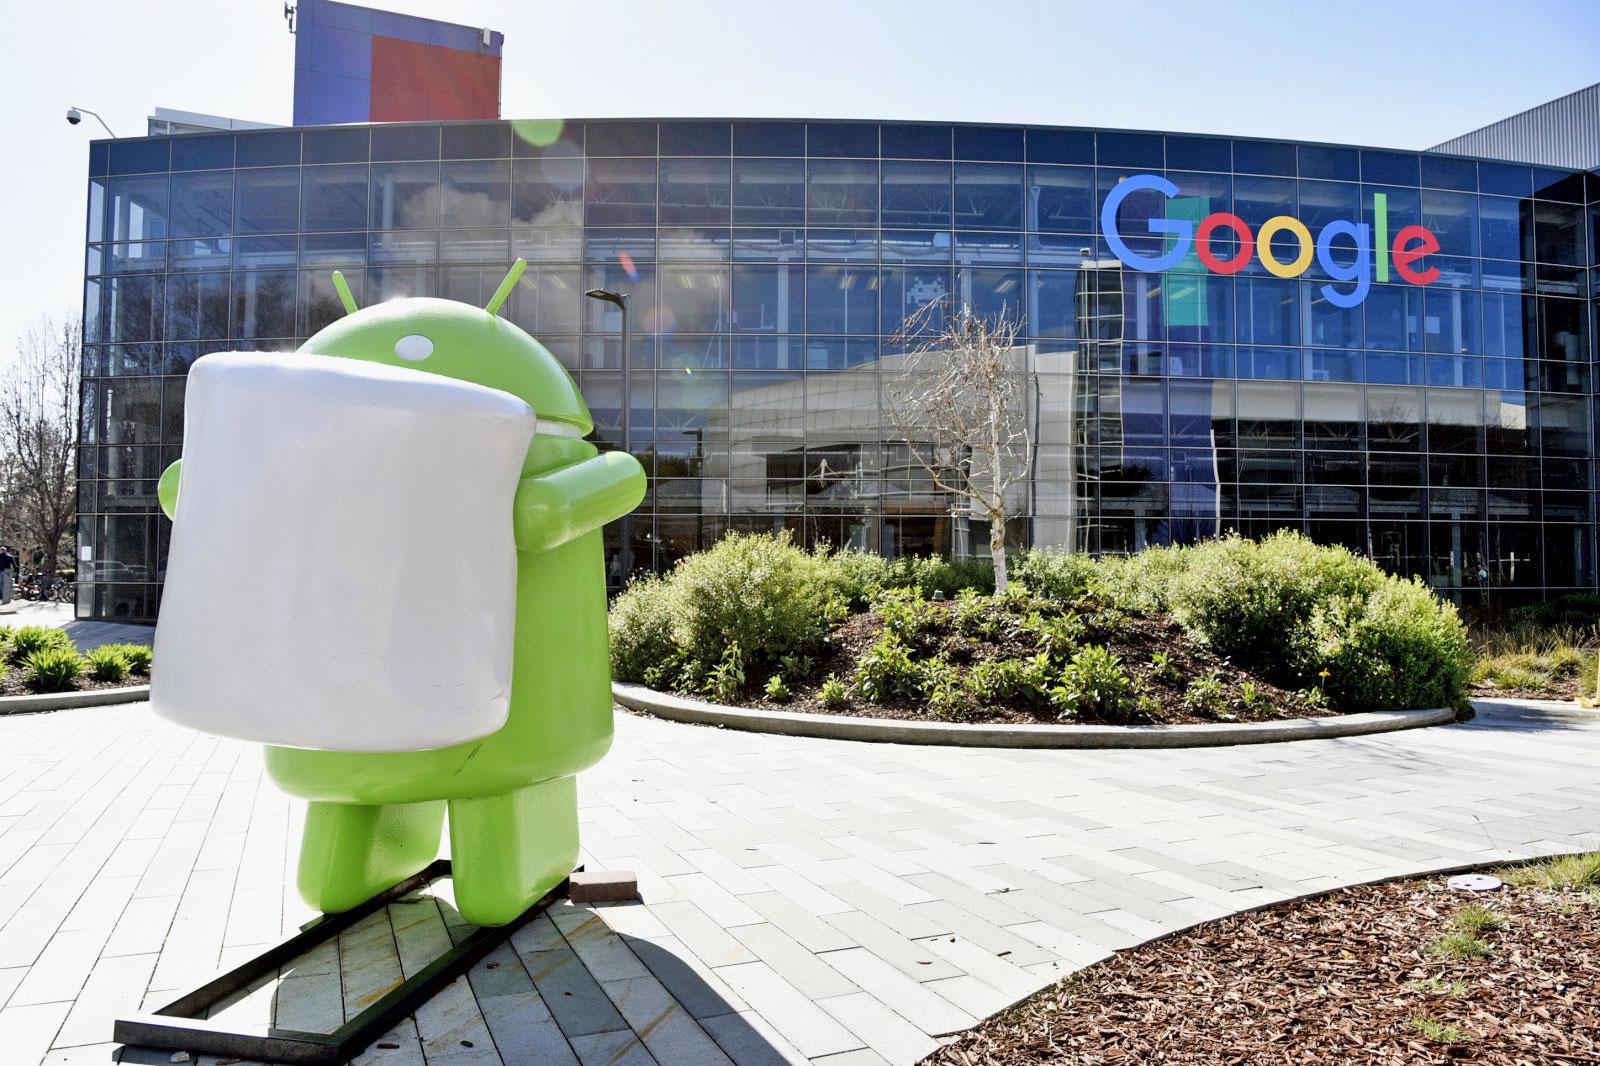 Google and Howard University partner for more diversity in tech